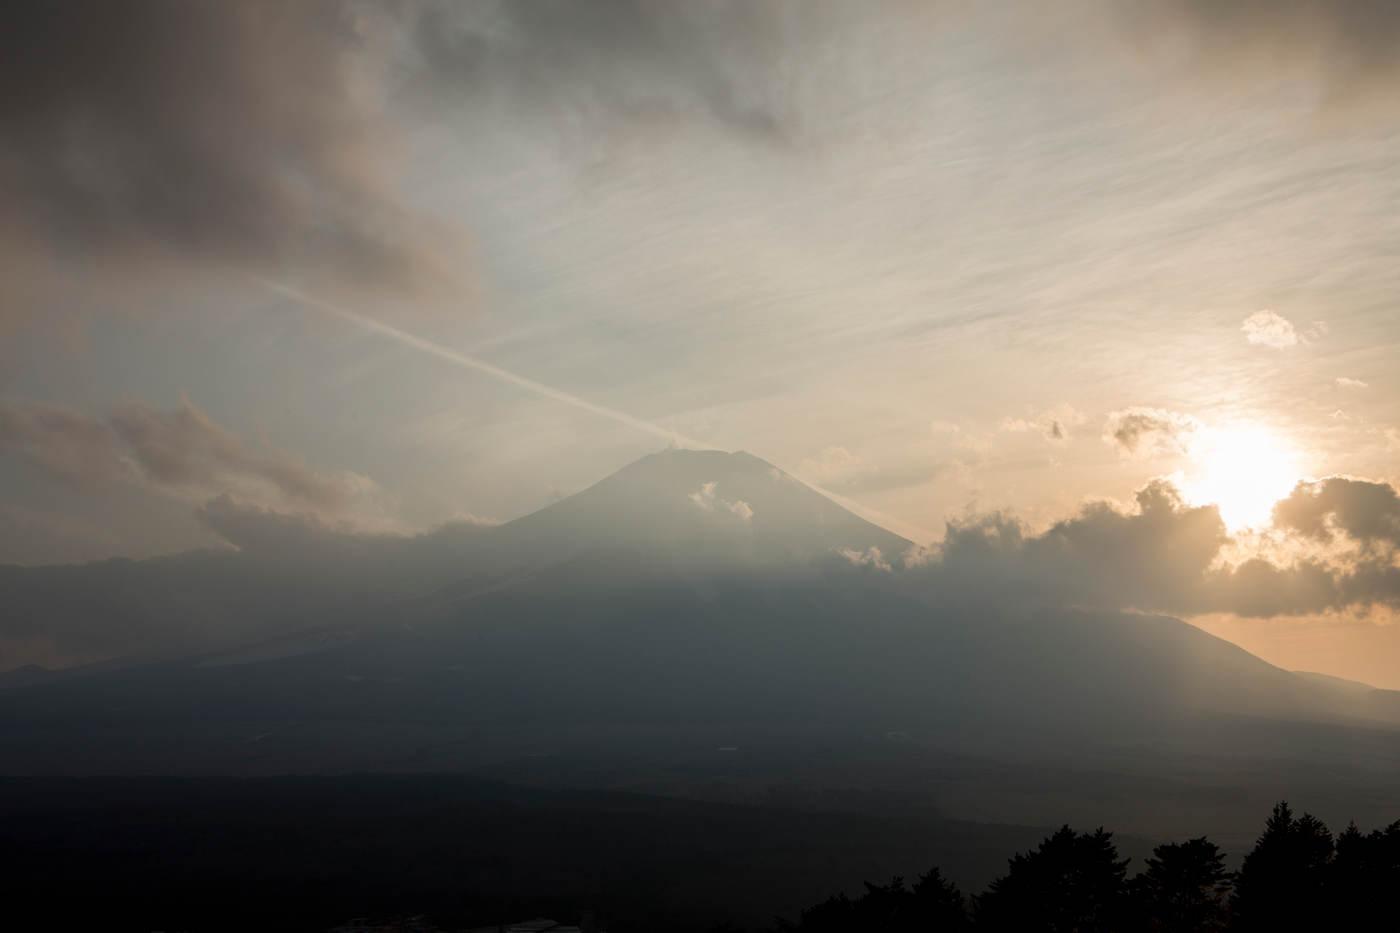 Storm clouds aroud Mt. Fuji.